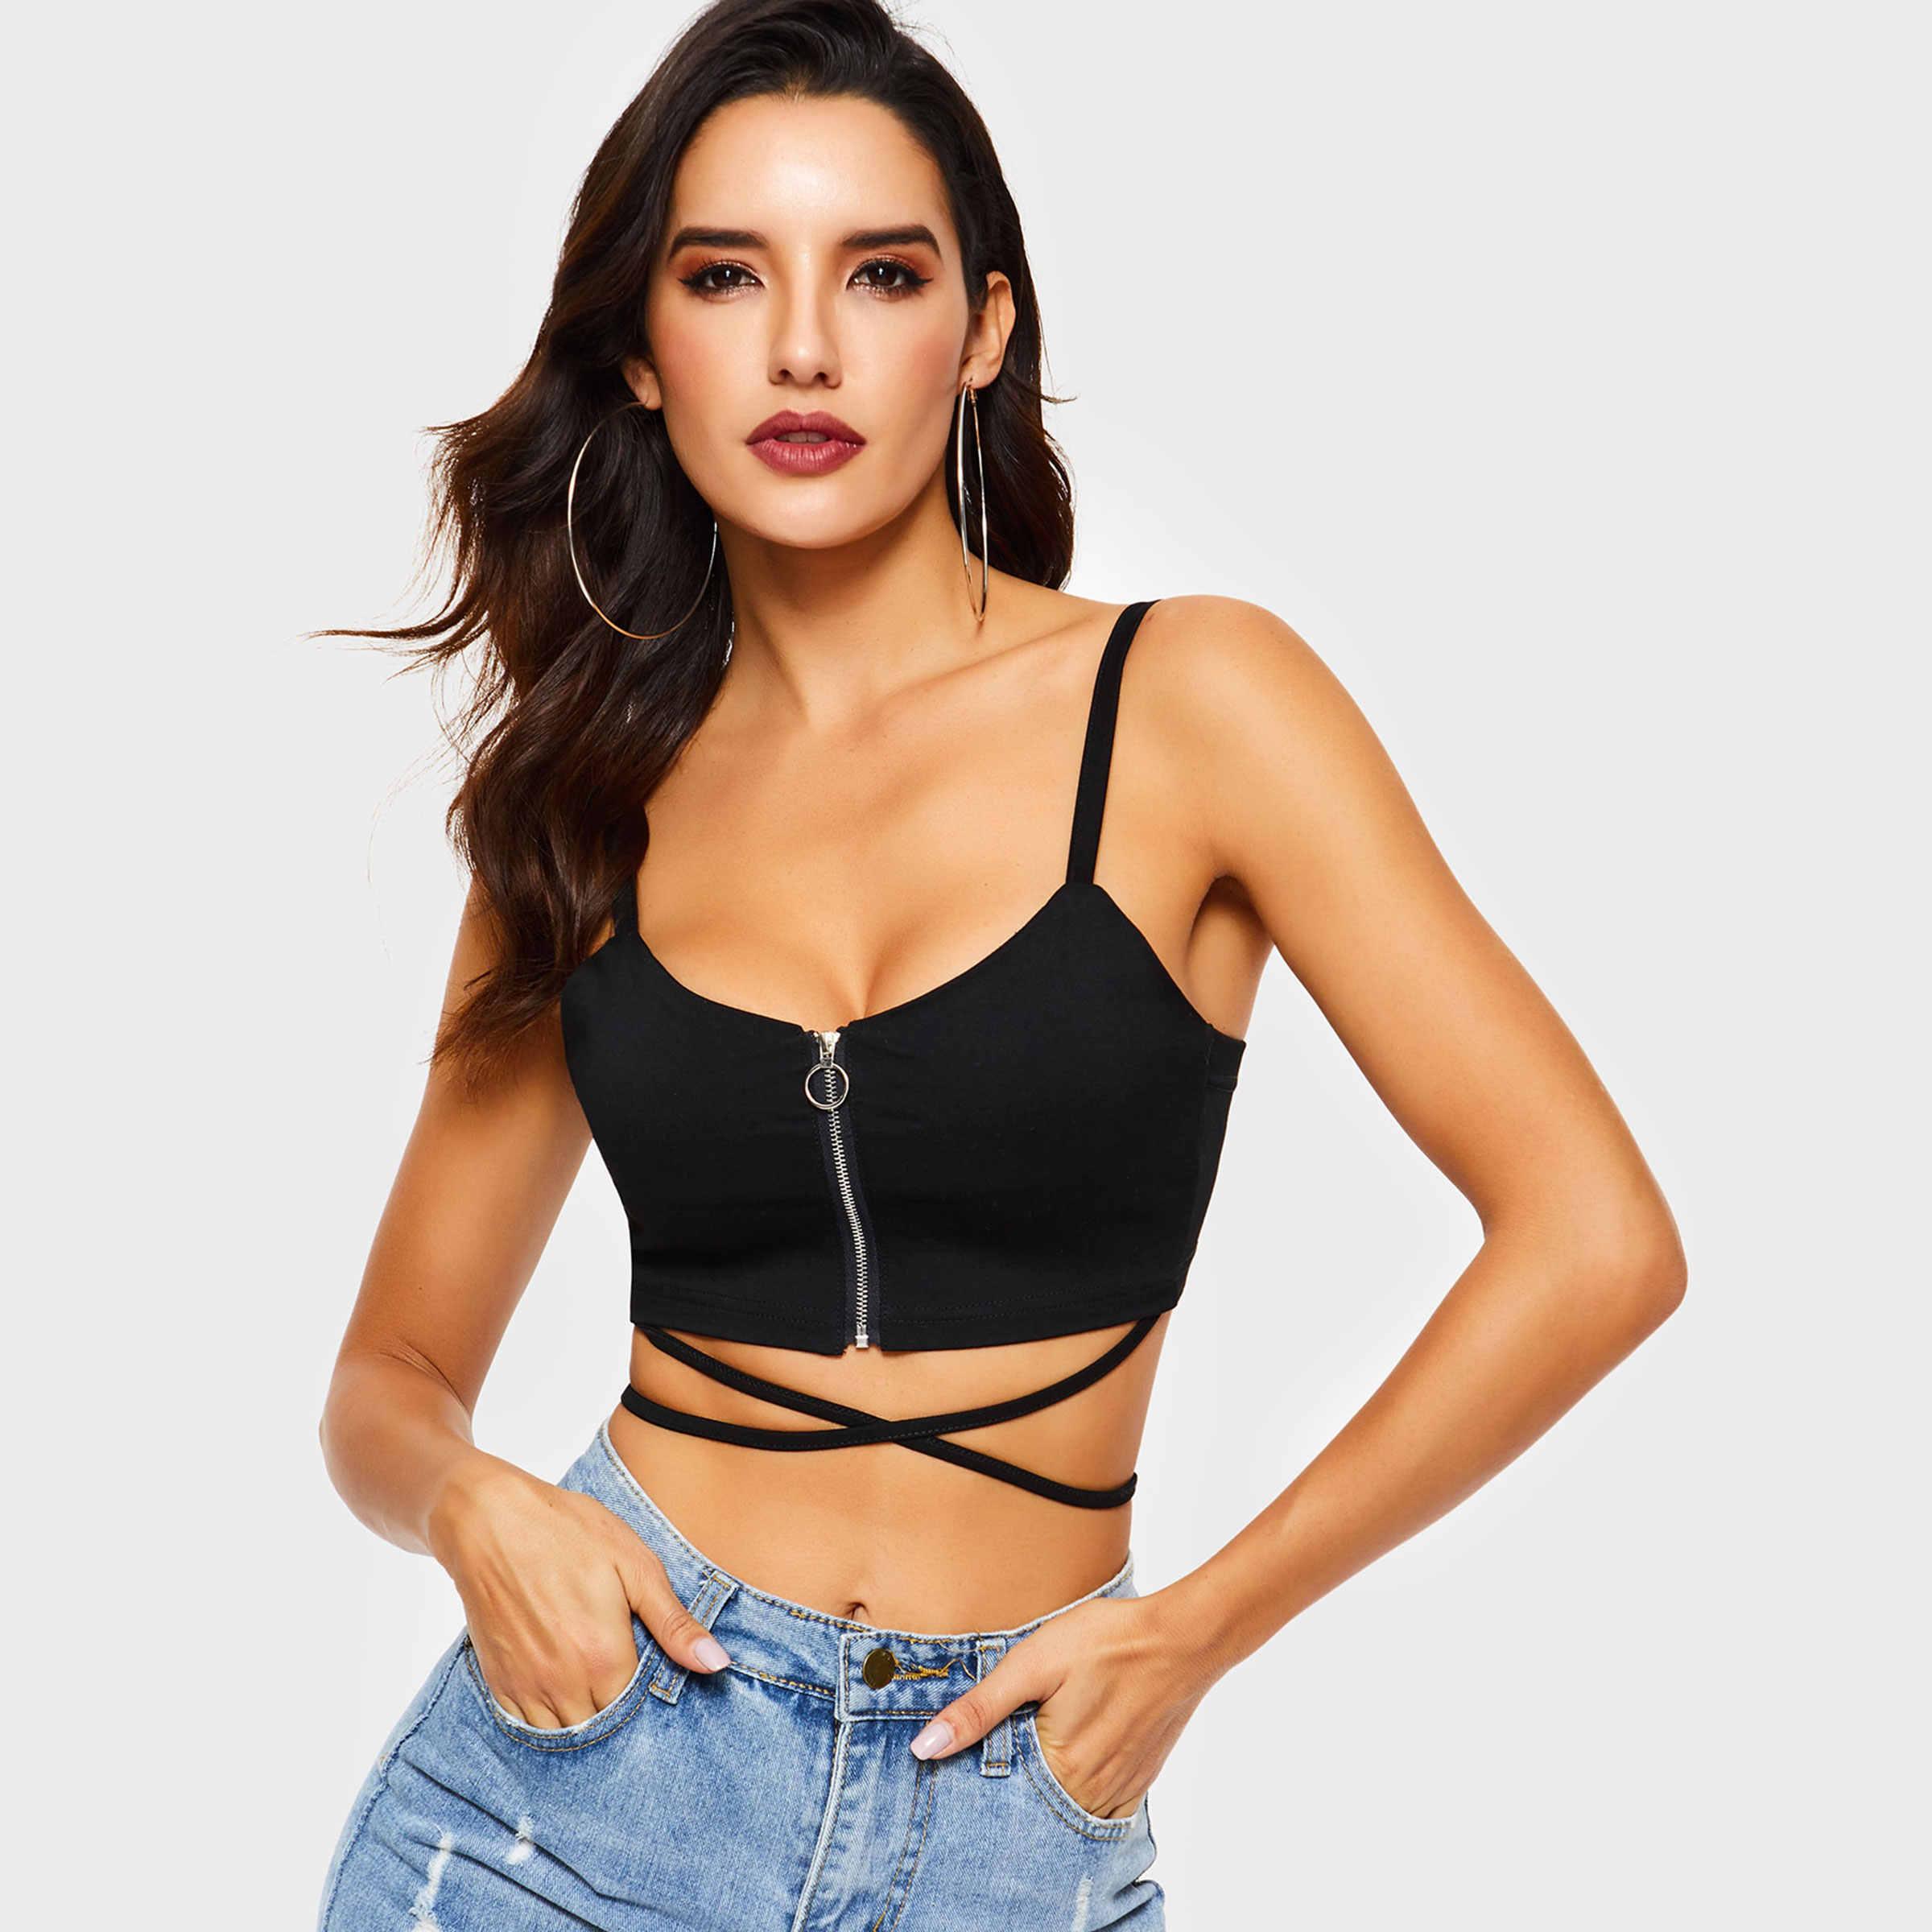 2019 Women Sleeveless Sexy Bandage T Shirt Top Fashion Black Lace Up Tank Top Party Club Wear Slim Waist Front  Zipper Crop Top